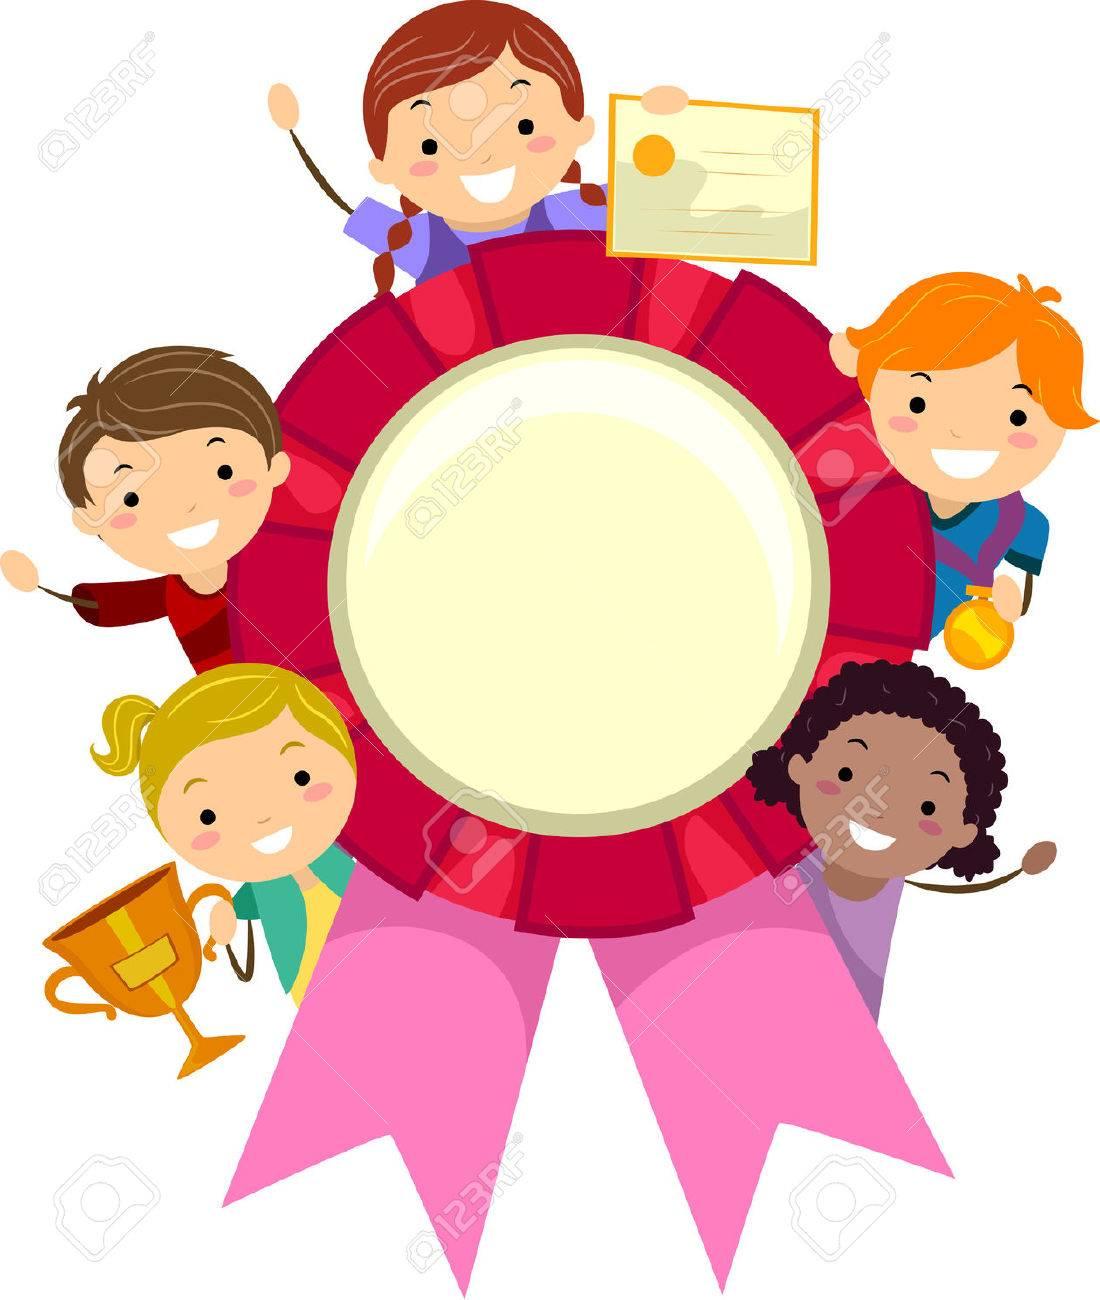 Stickman Illustration of Kids Holding Different Awards.